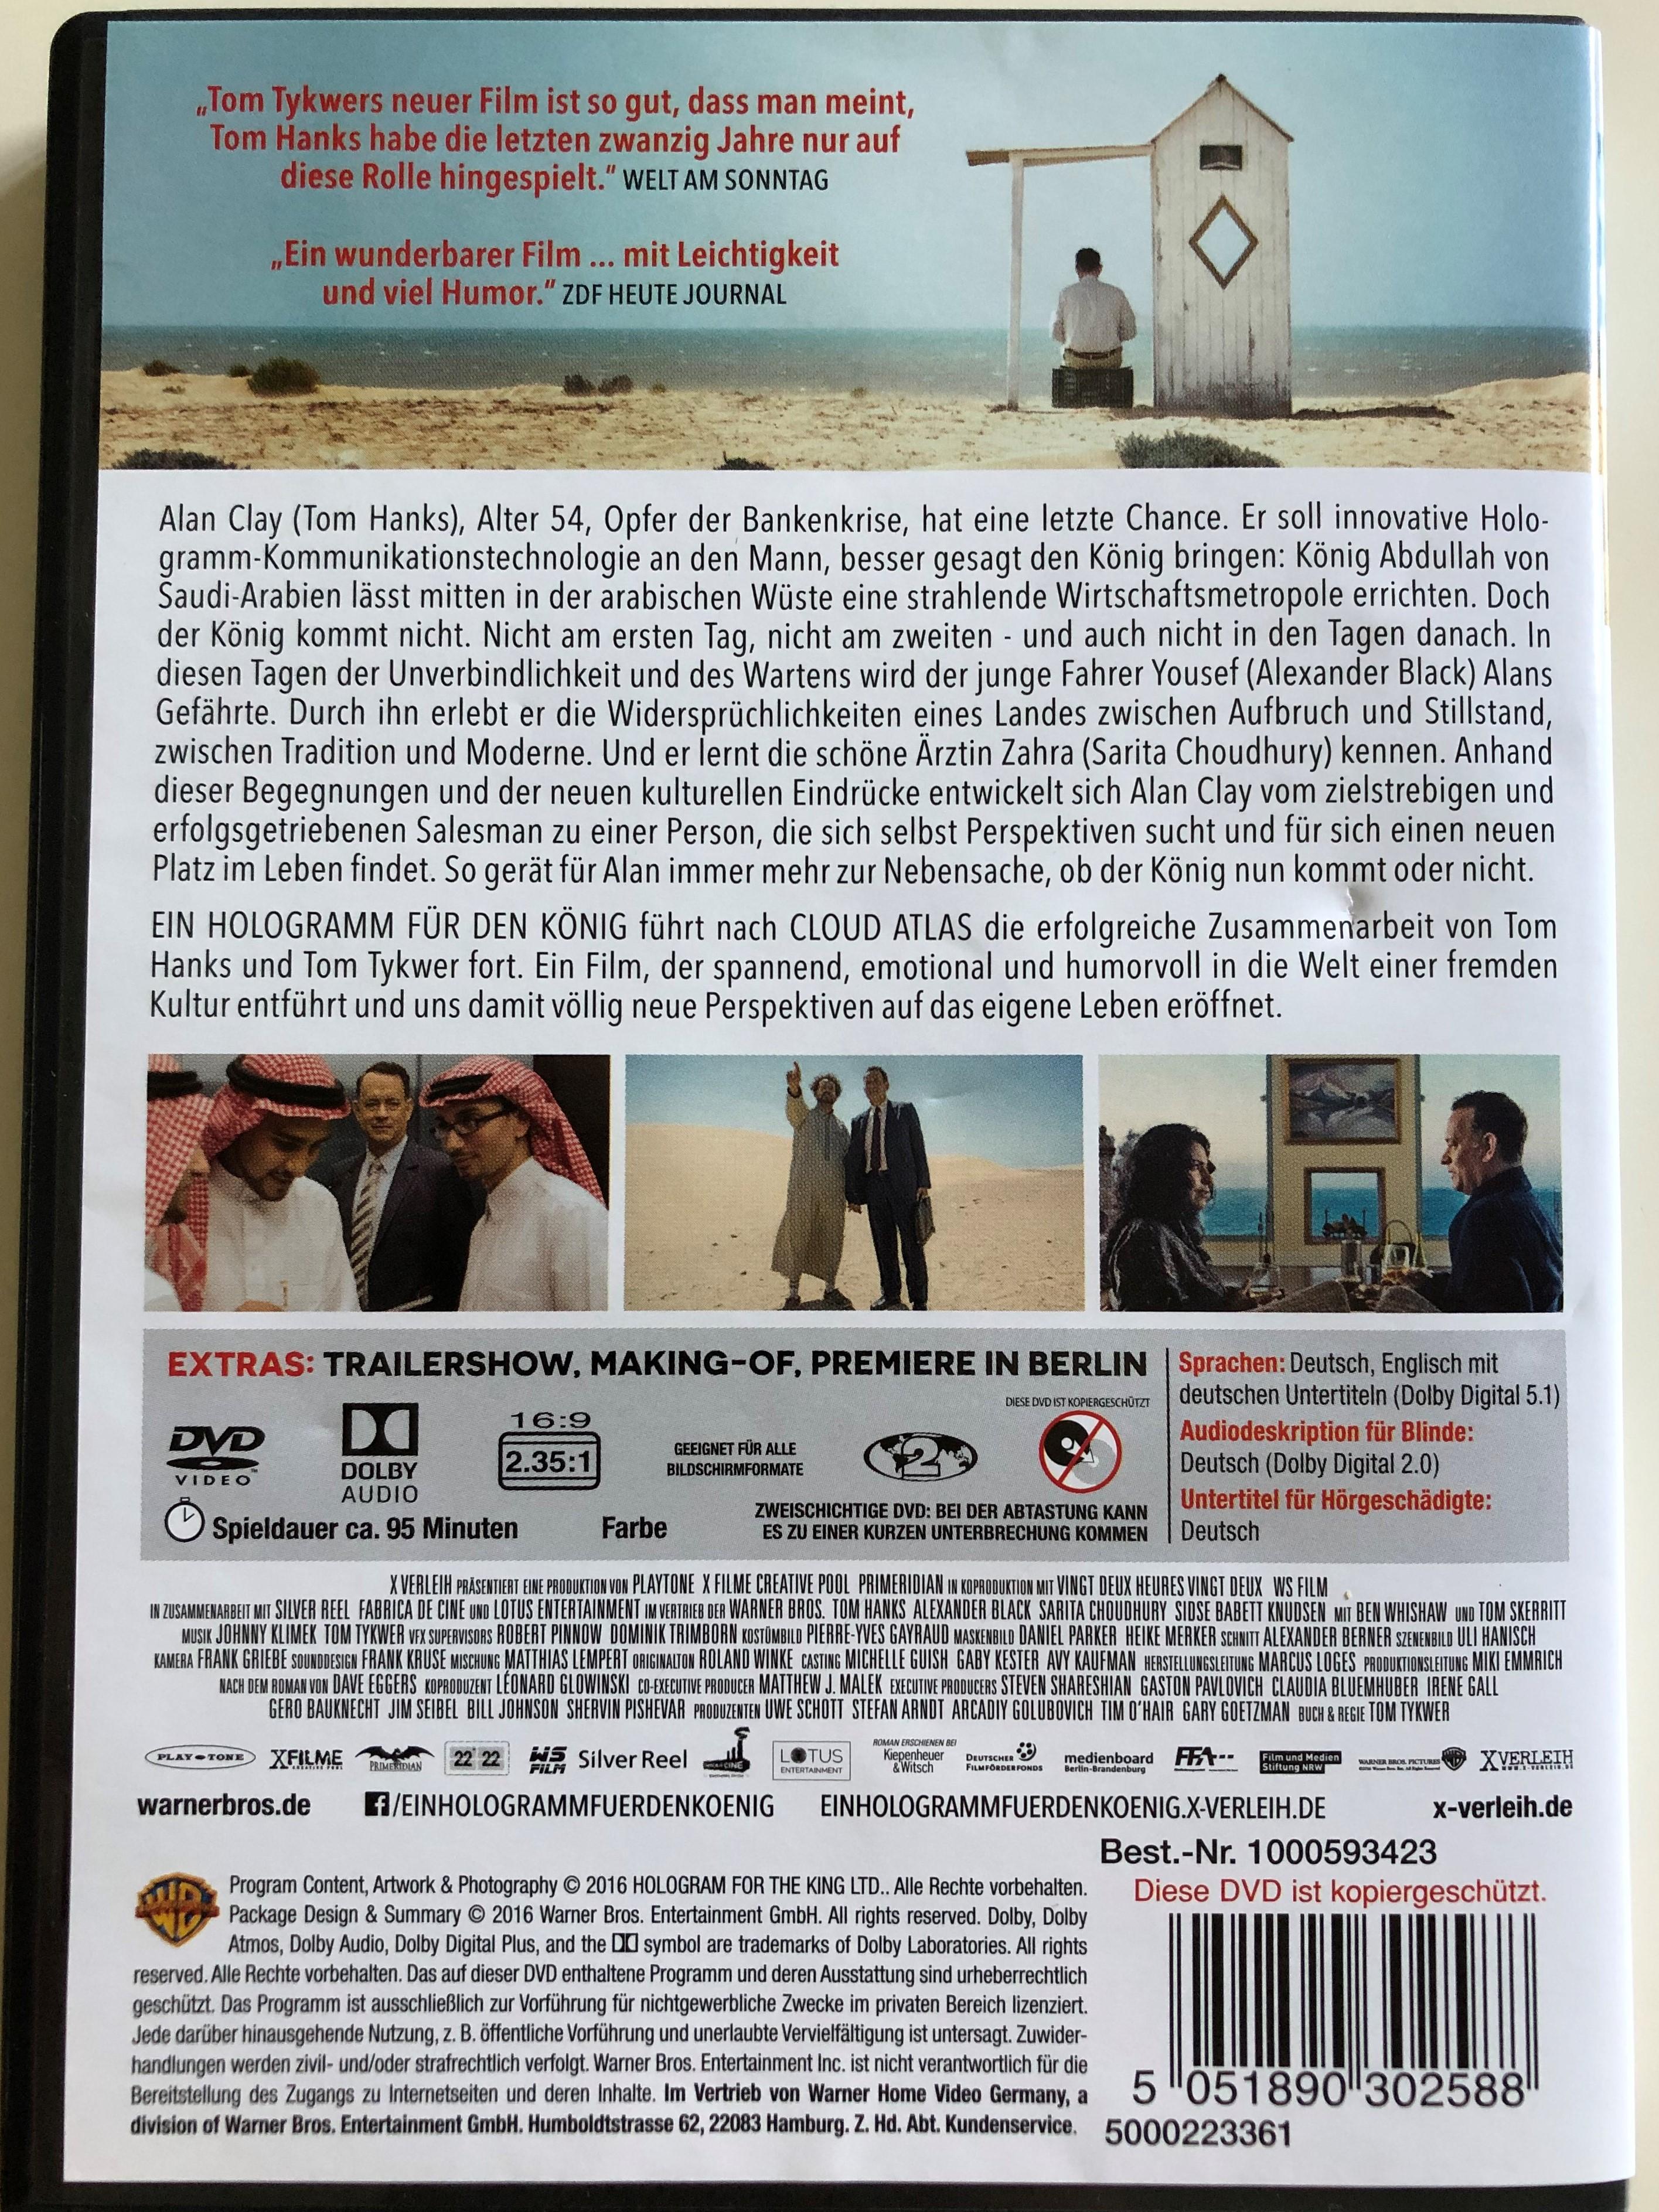 a-hologram-for-the-king-dvd-2016-ein-hologram-f-r-den-k-nig-directed-by-tom-tykwer-starring-tom-hanks-alexander-black-sarita-choudhury-sidse-babett-knudsen-2-.jpg